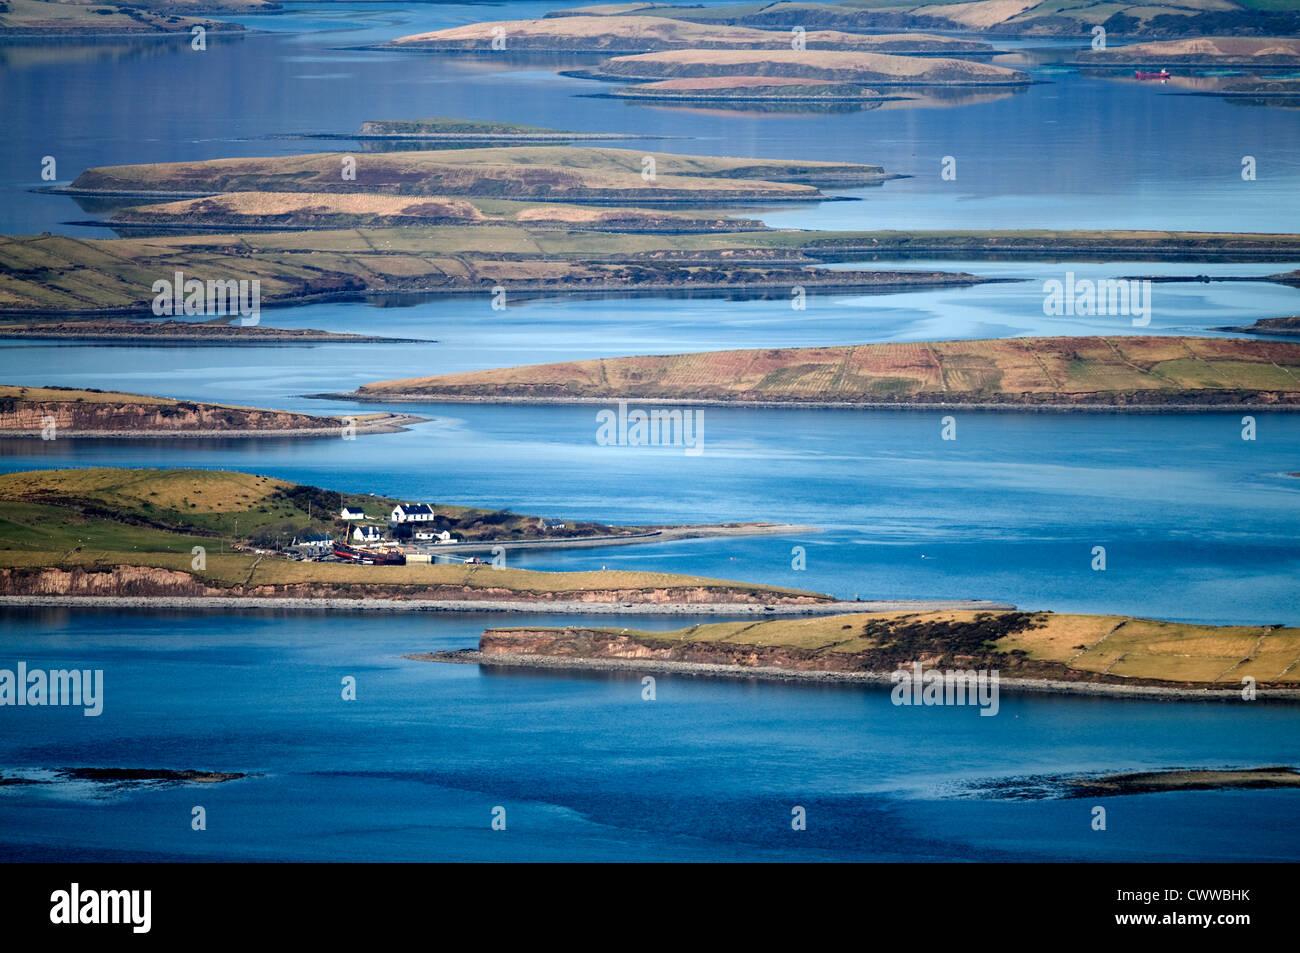 Aerial view of houses in rural marsh - Stock Image